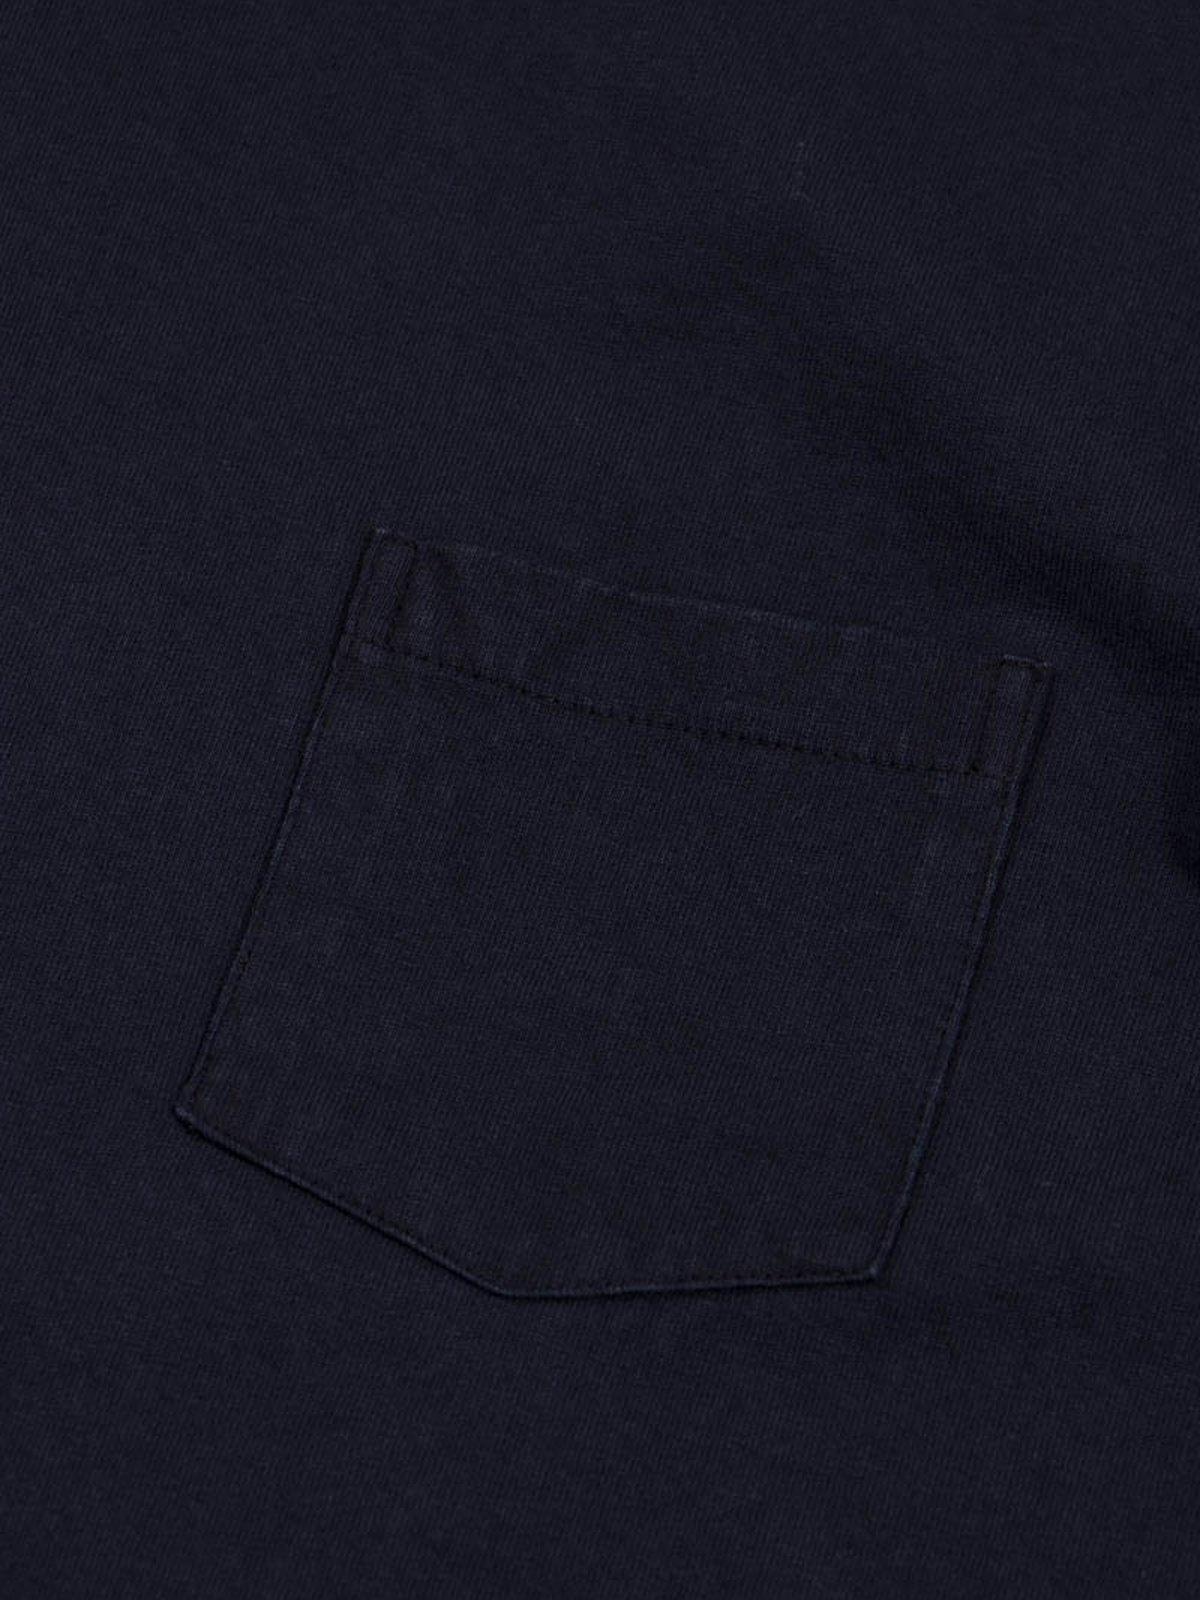 Black Indigo 1–Pac Pocket Tee - Image 5